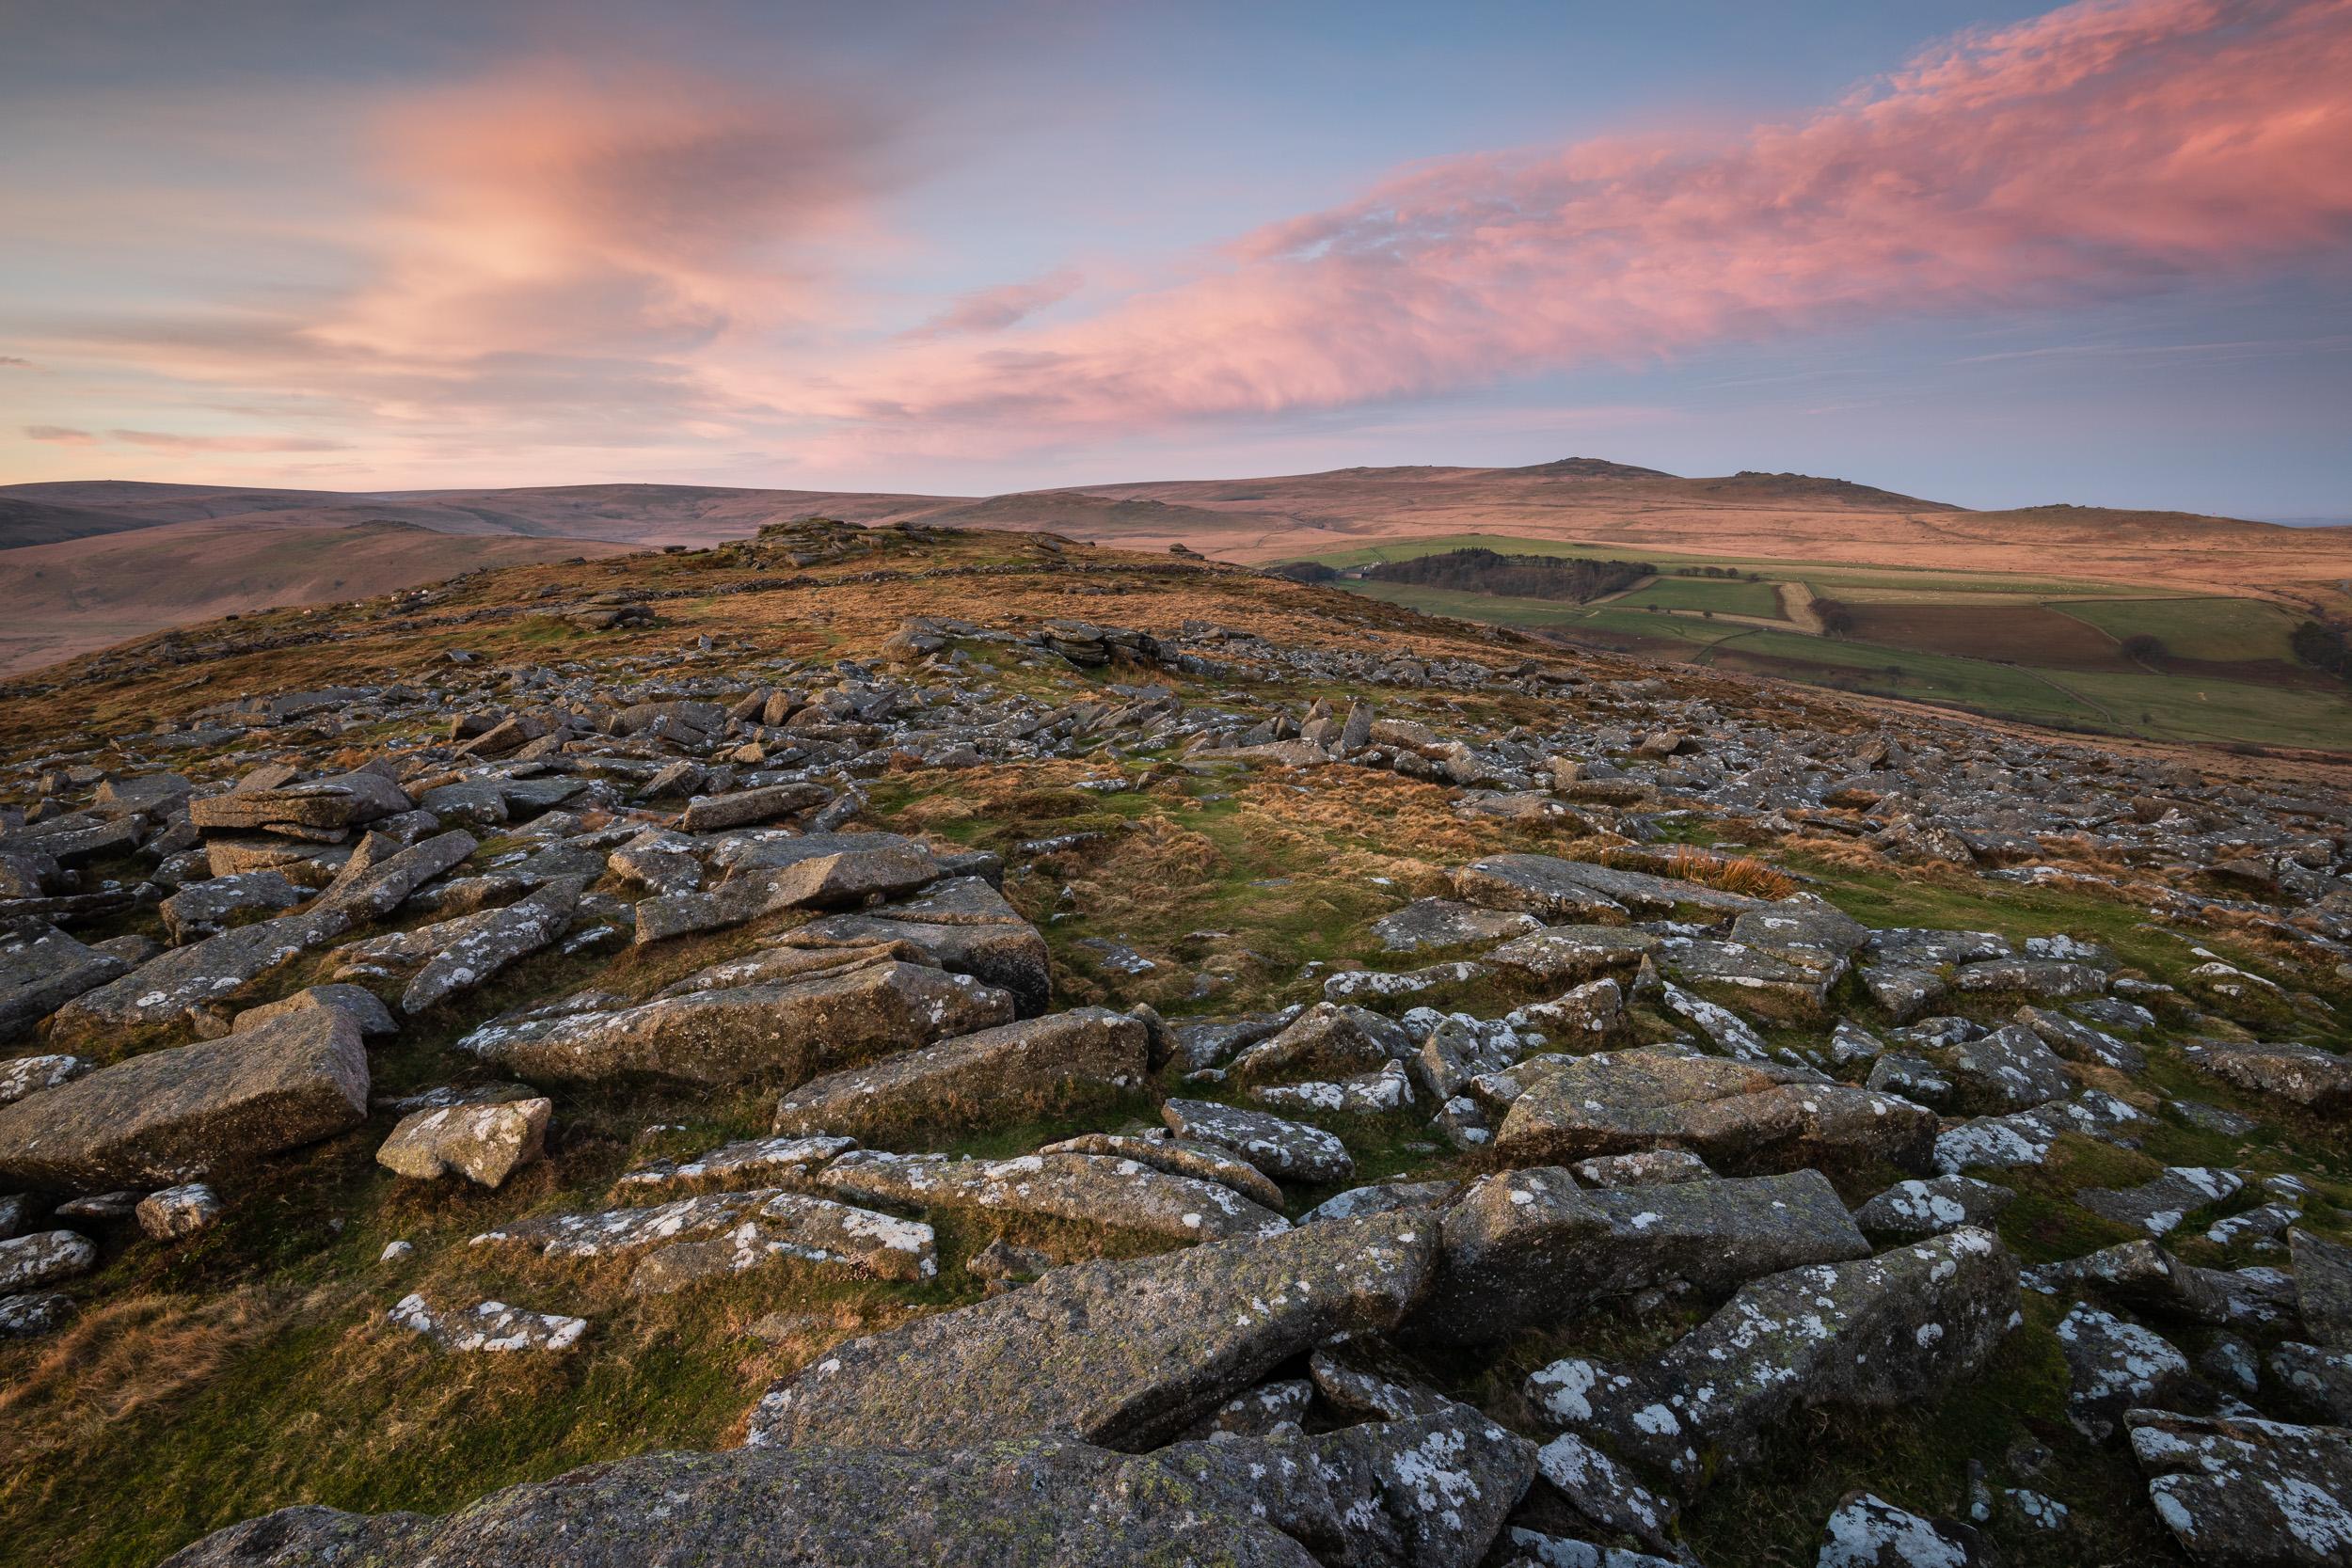 Dawn on Belstone Common, Dartmoor, Devon  - Nikon D850, Nikkor 16-35 mm f/4 @ 16 mm, f/13, 5 secs @ ISO 64.